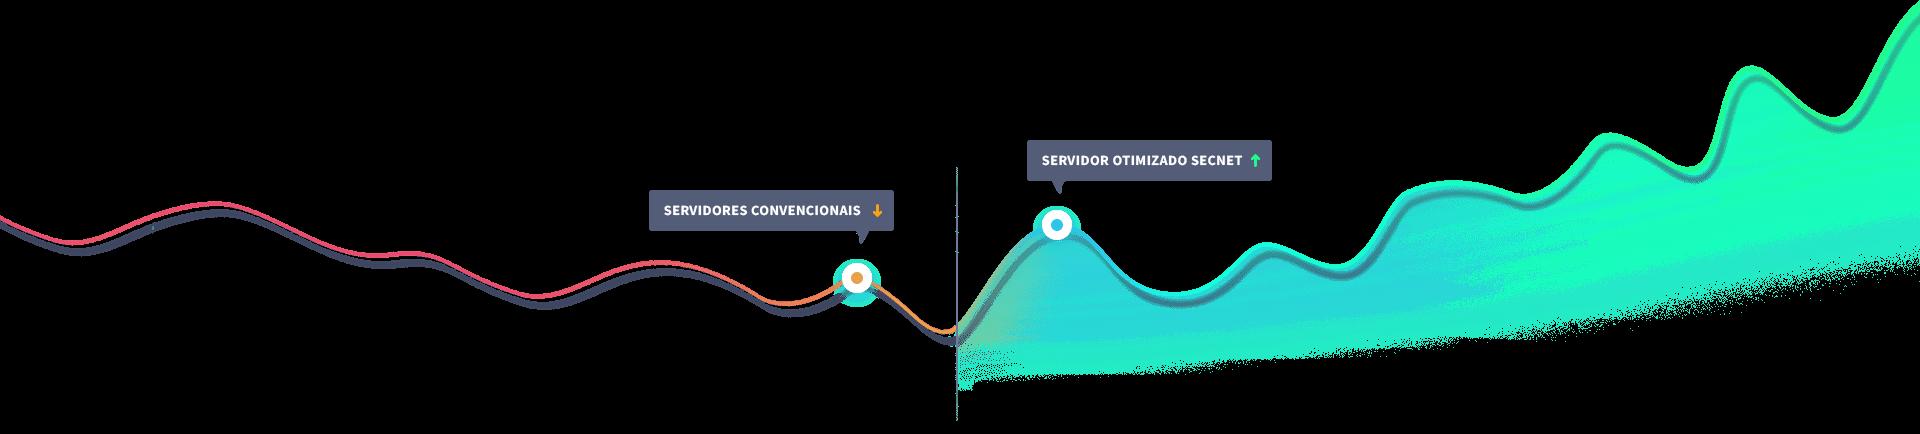 Ambiente de alto desempenho - SECNET